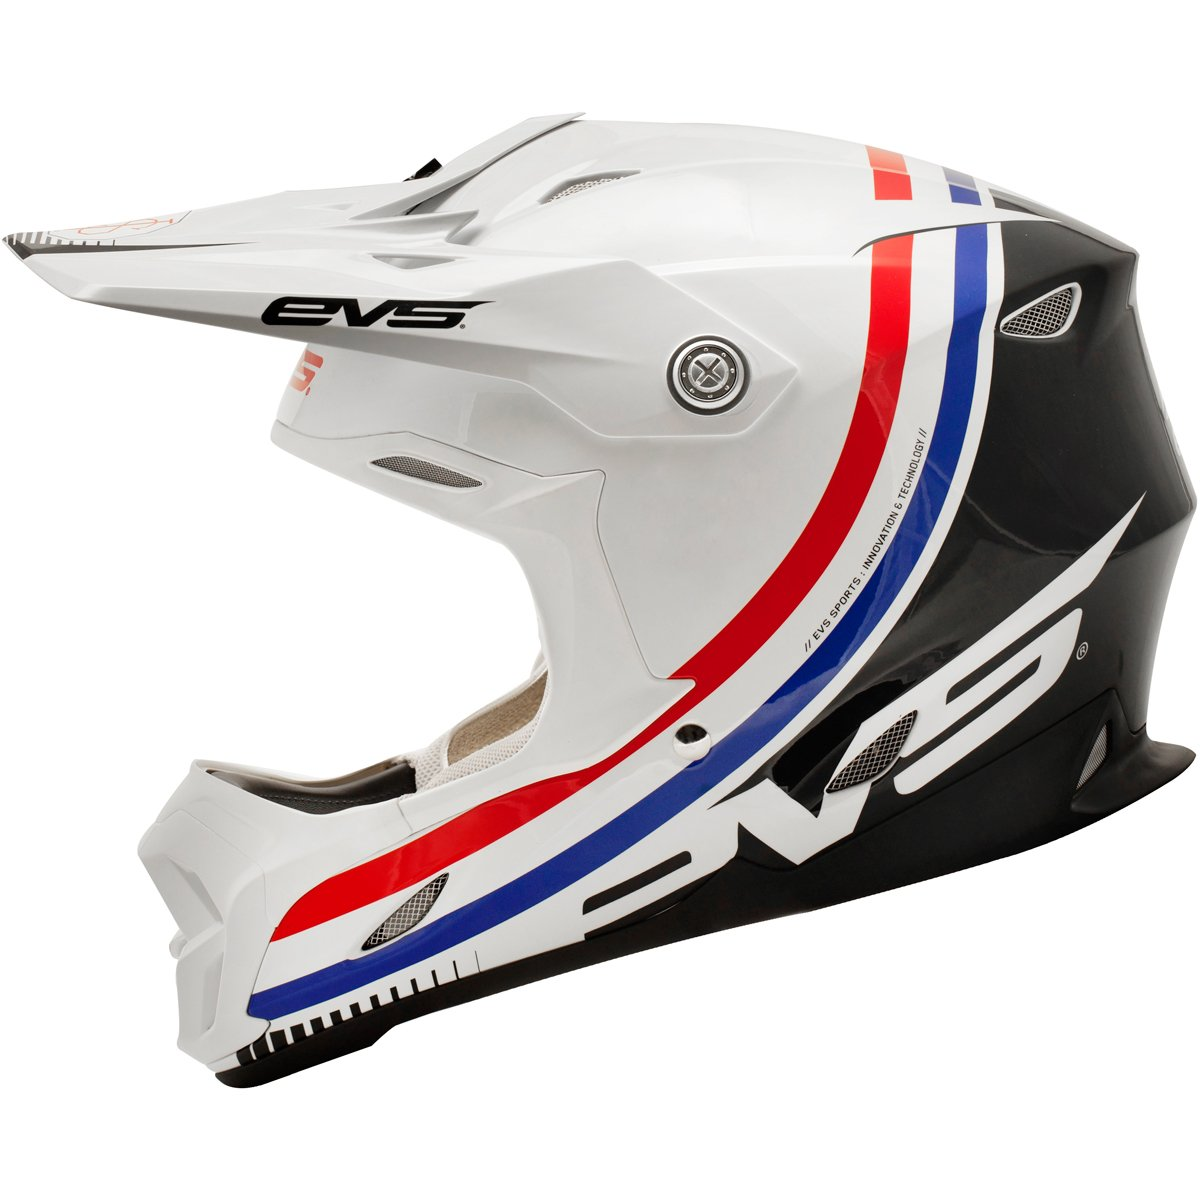 EVS T7 Helmet: The T7 Helmet is a